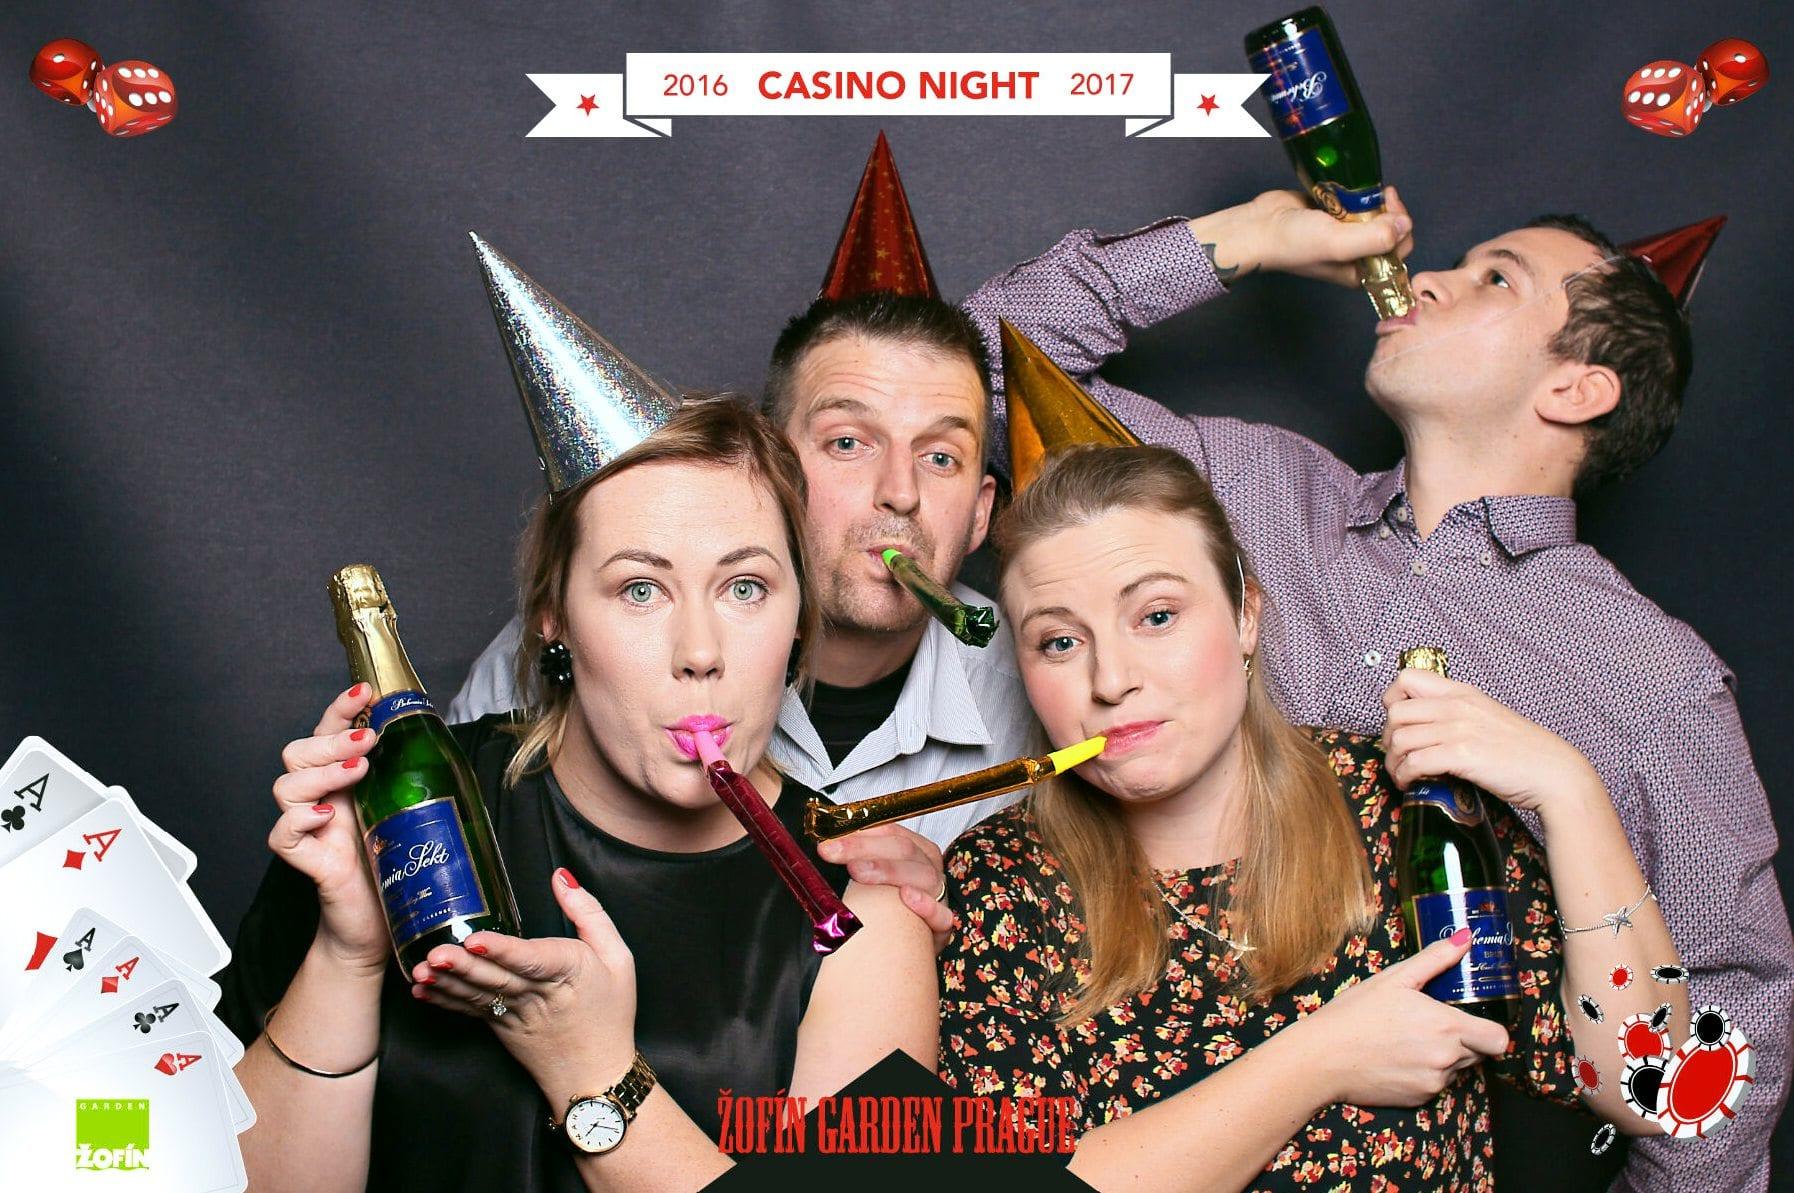 fotokoutek-zofin-garden-prague-casino-night-31-12-2016-200743